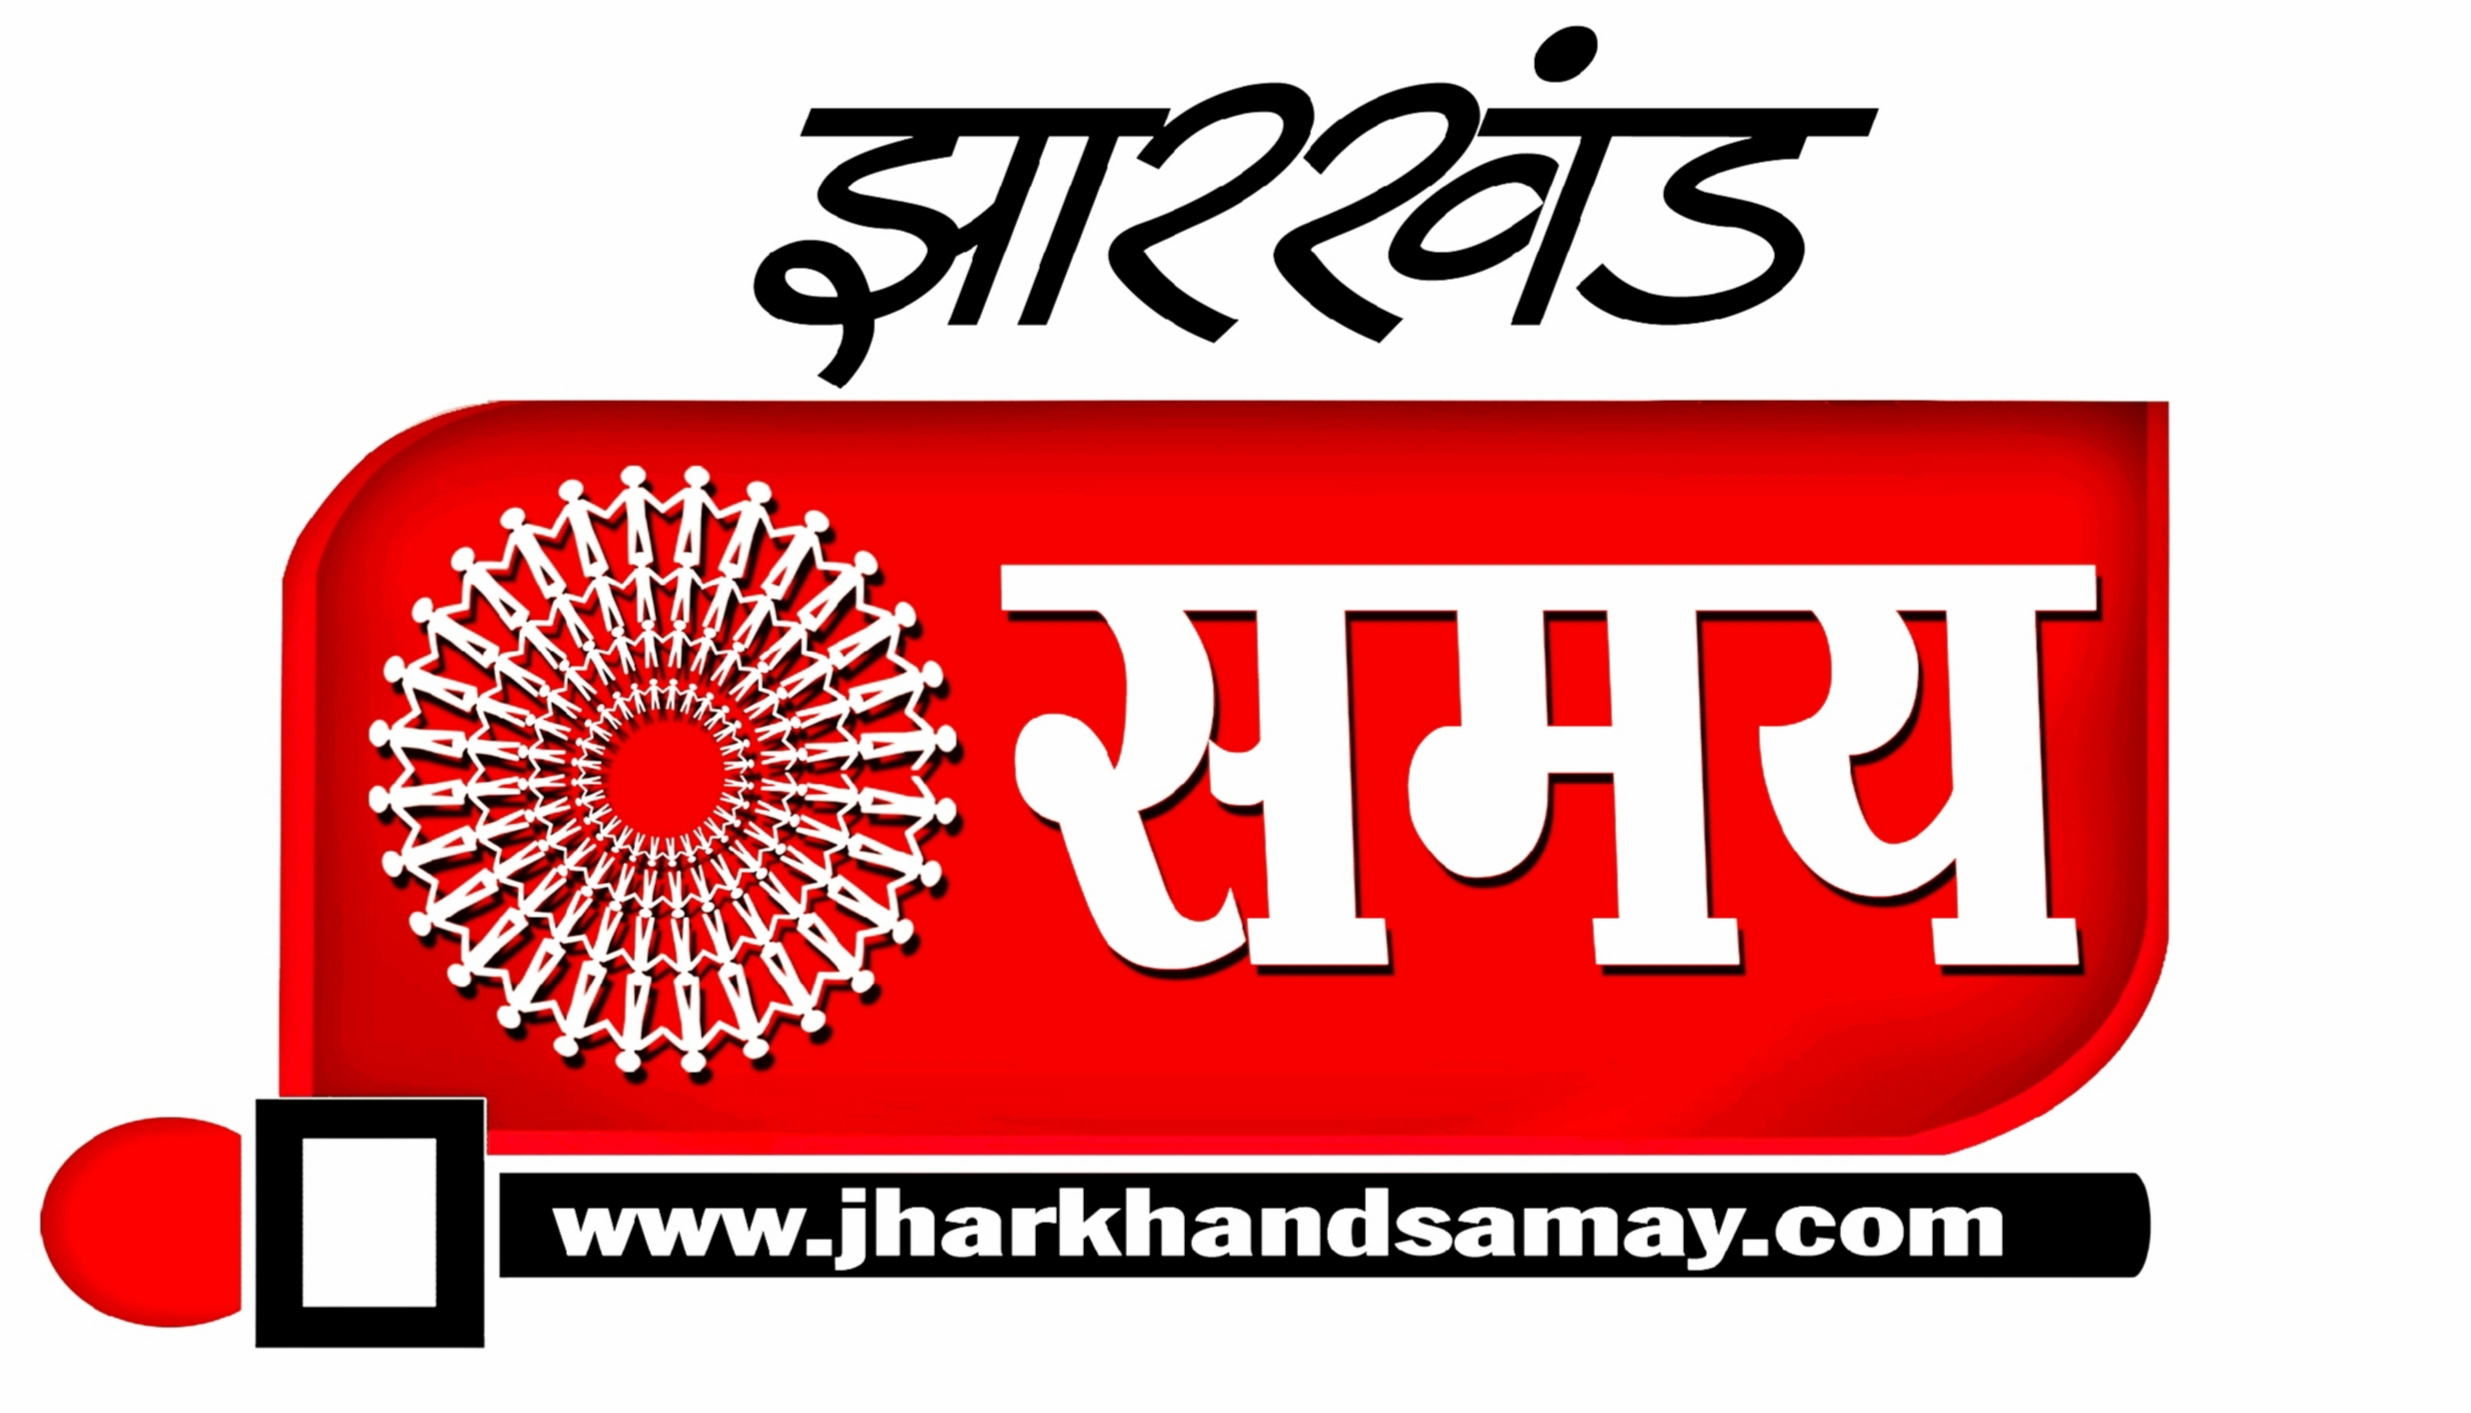 Jharkhand Samay